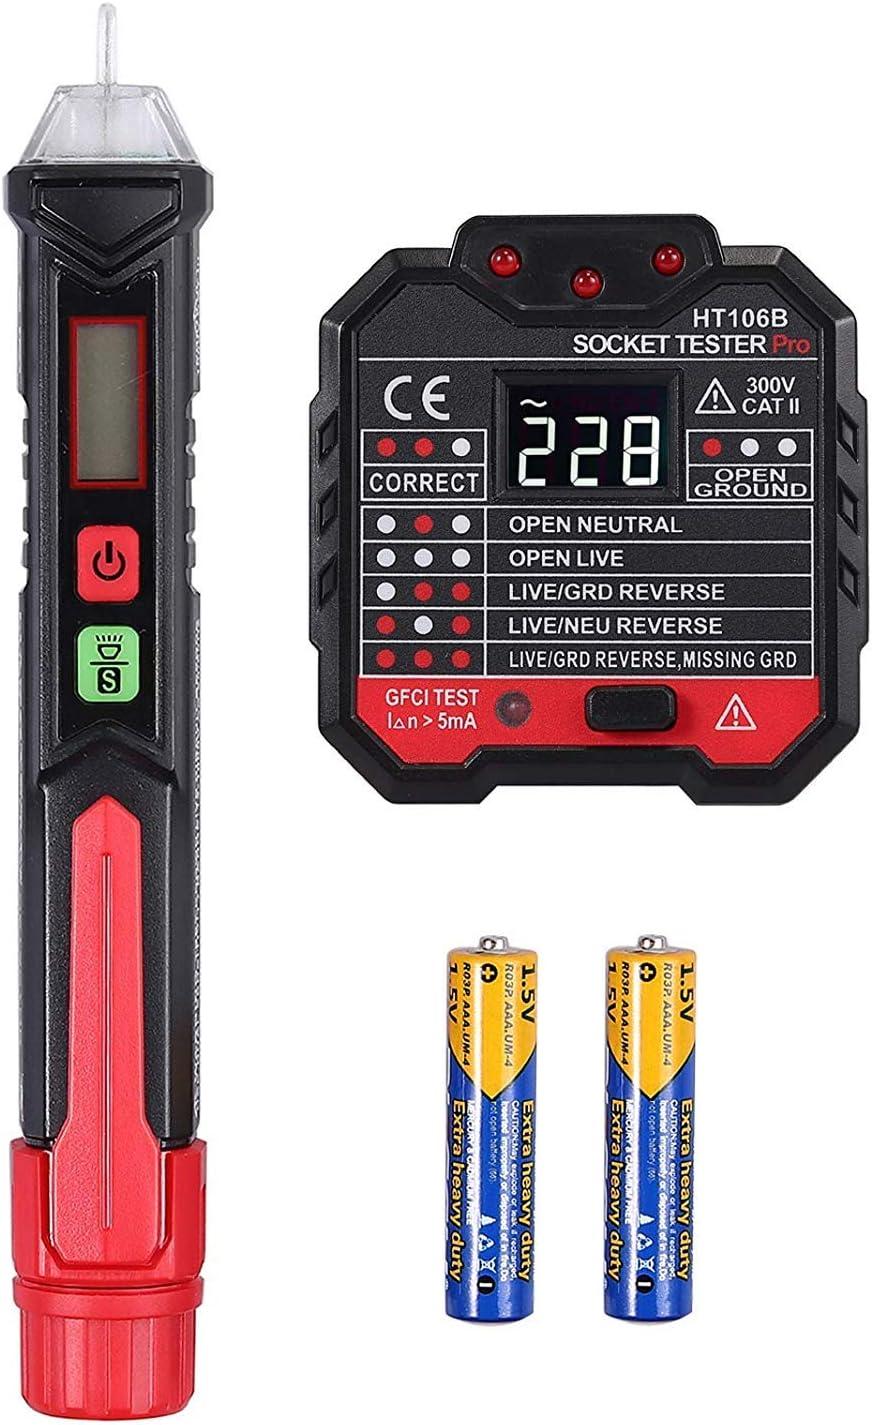 Proster Non Contact Voltage Tester Pen 12-1000V + Socket Tester 48V~250V Wall AC Power Outlet Tester Adjustable Sensitivity Electrical AC Voltage Detector with LED Flashlight Alarm